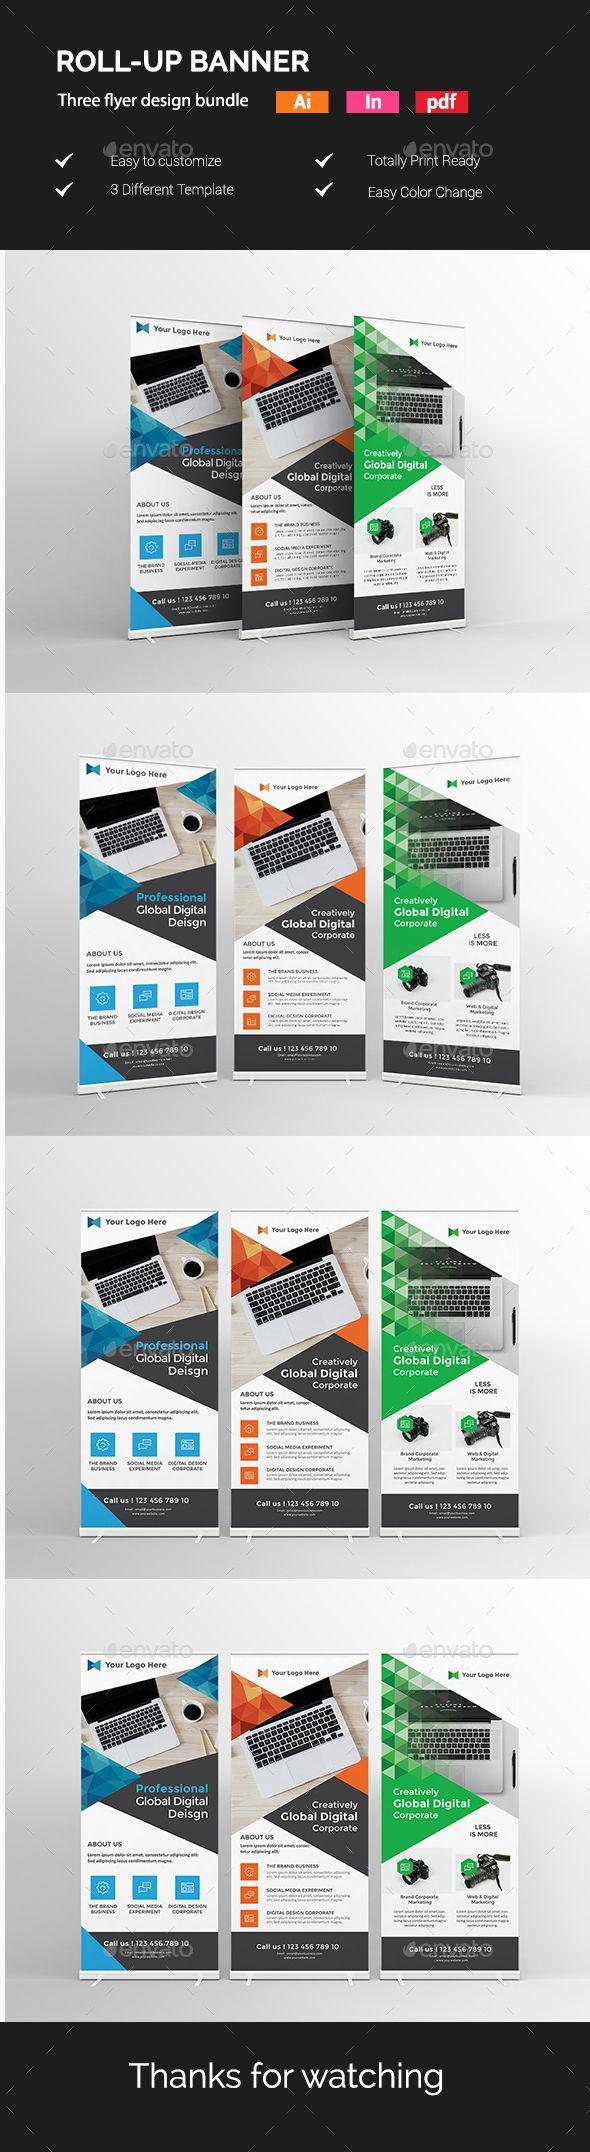 12 best roll-up design images on Pinterest | Print templates, Banner ...